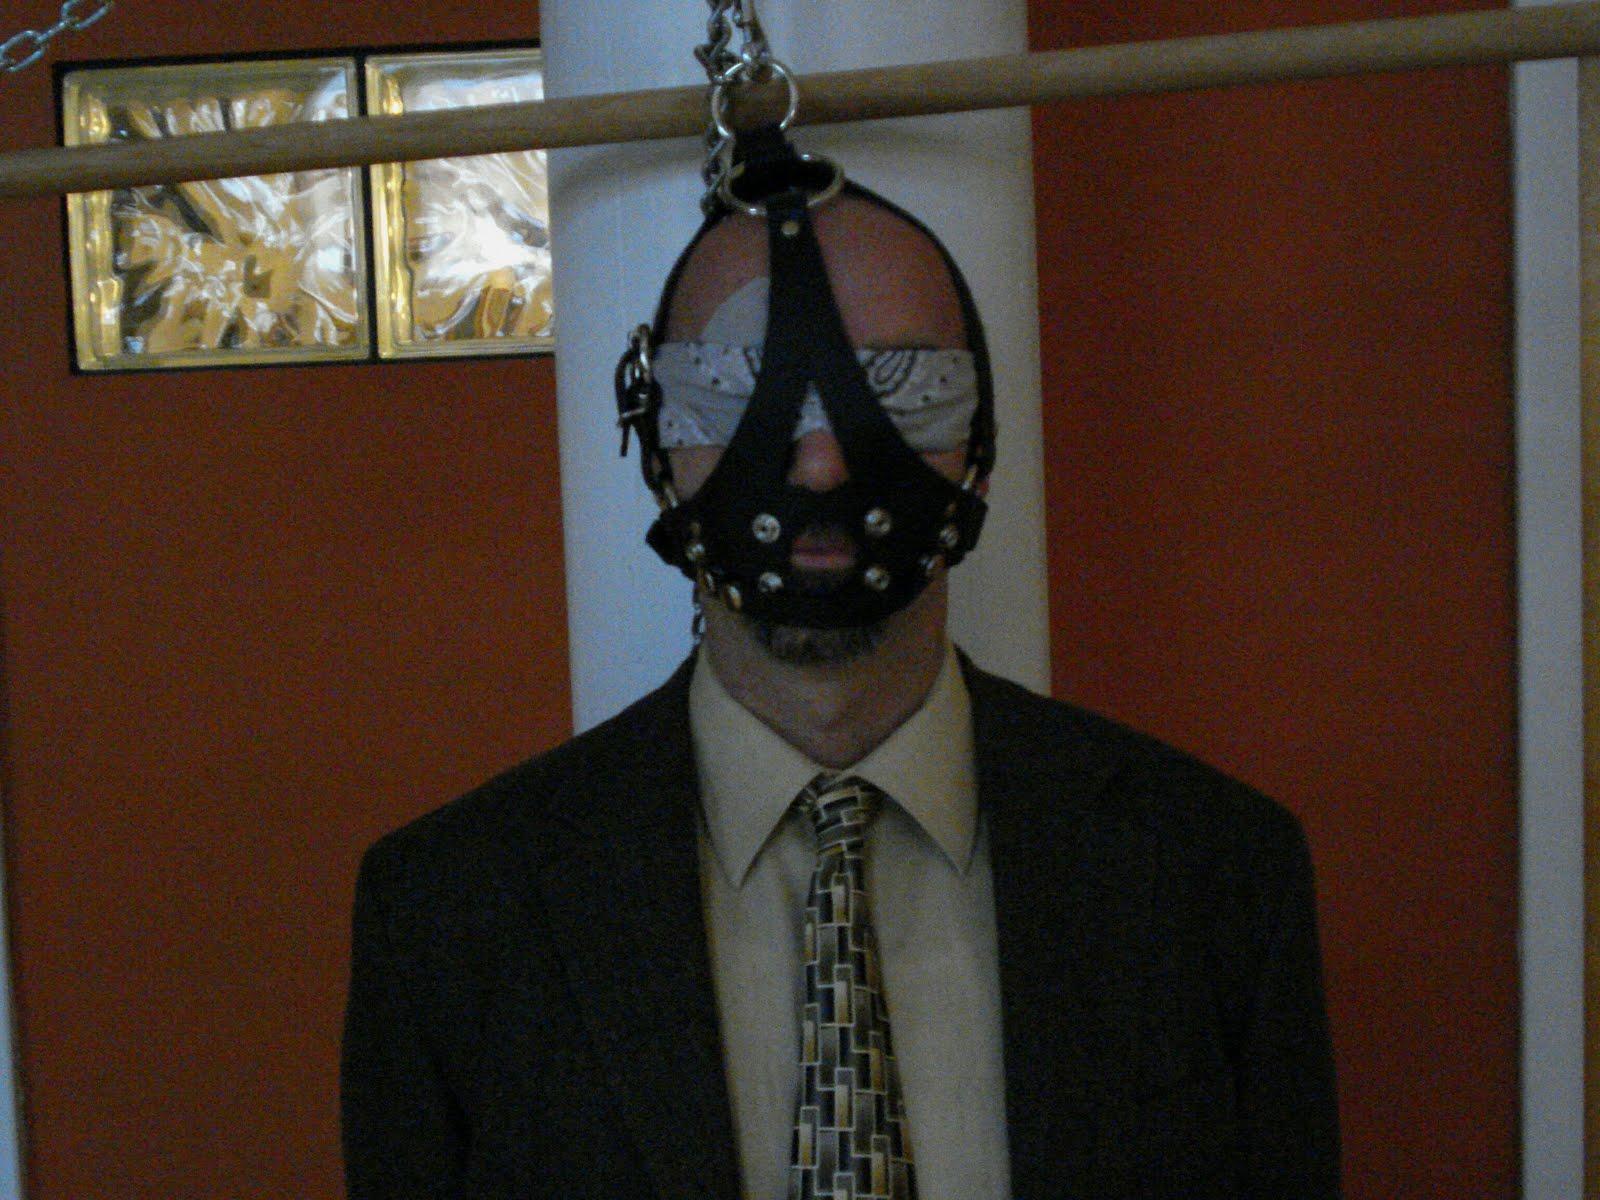 Suit and tie bondage